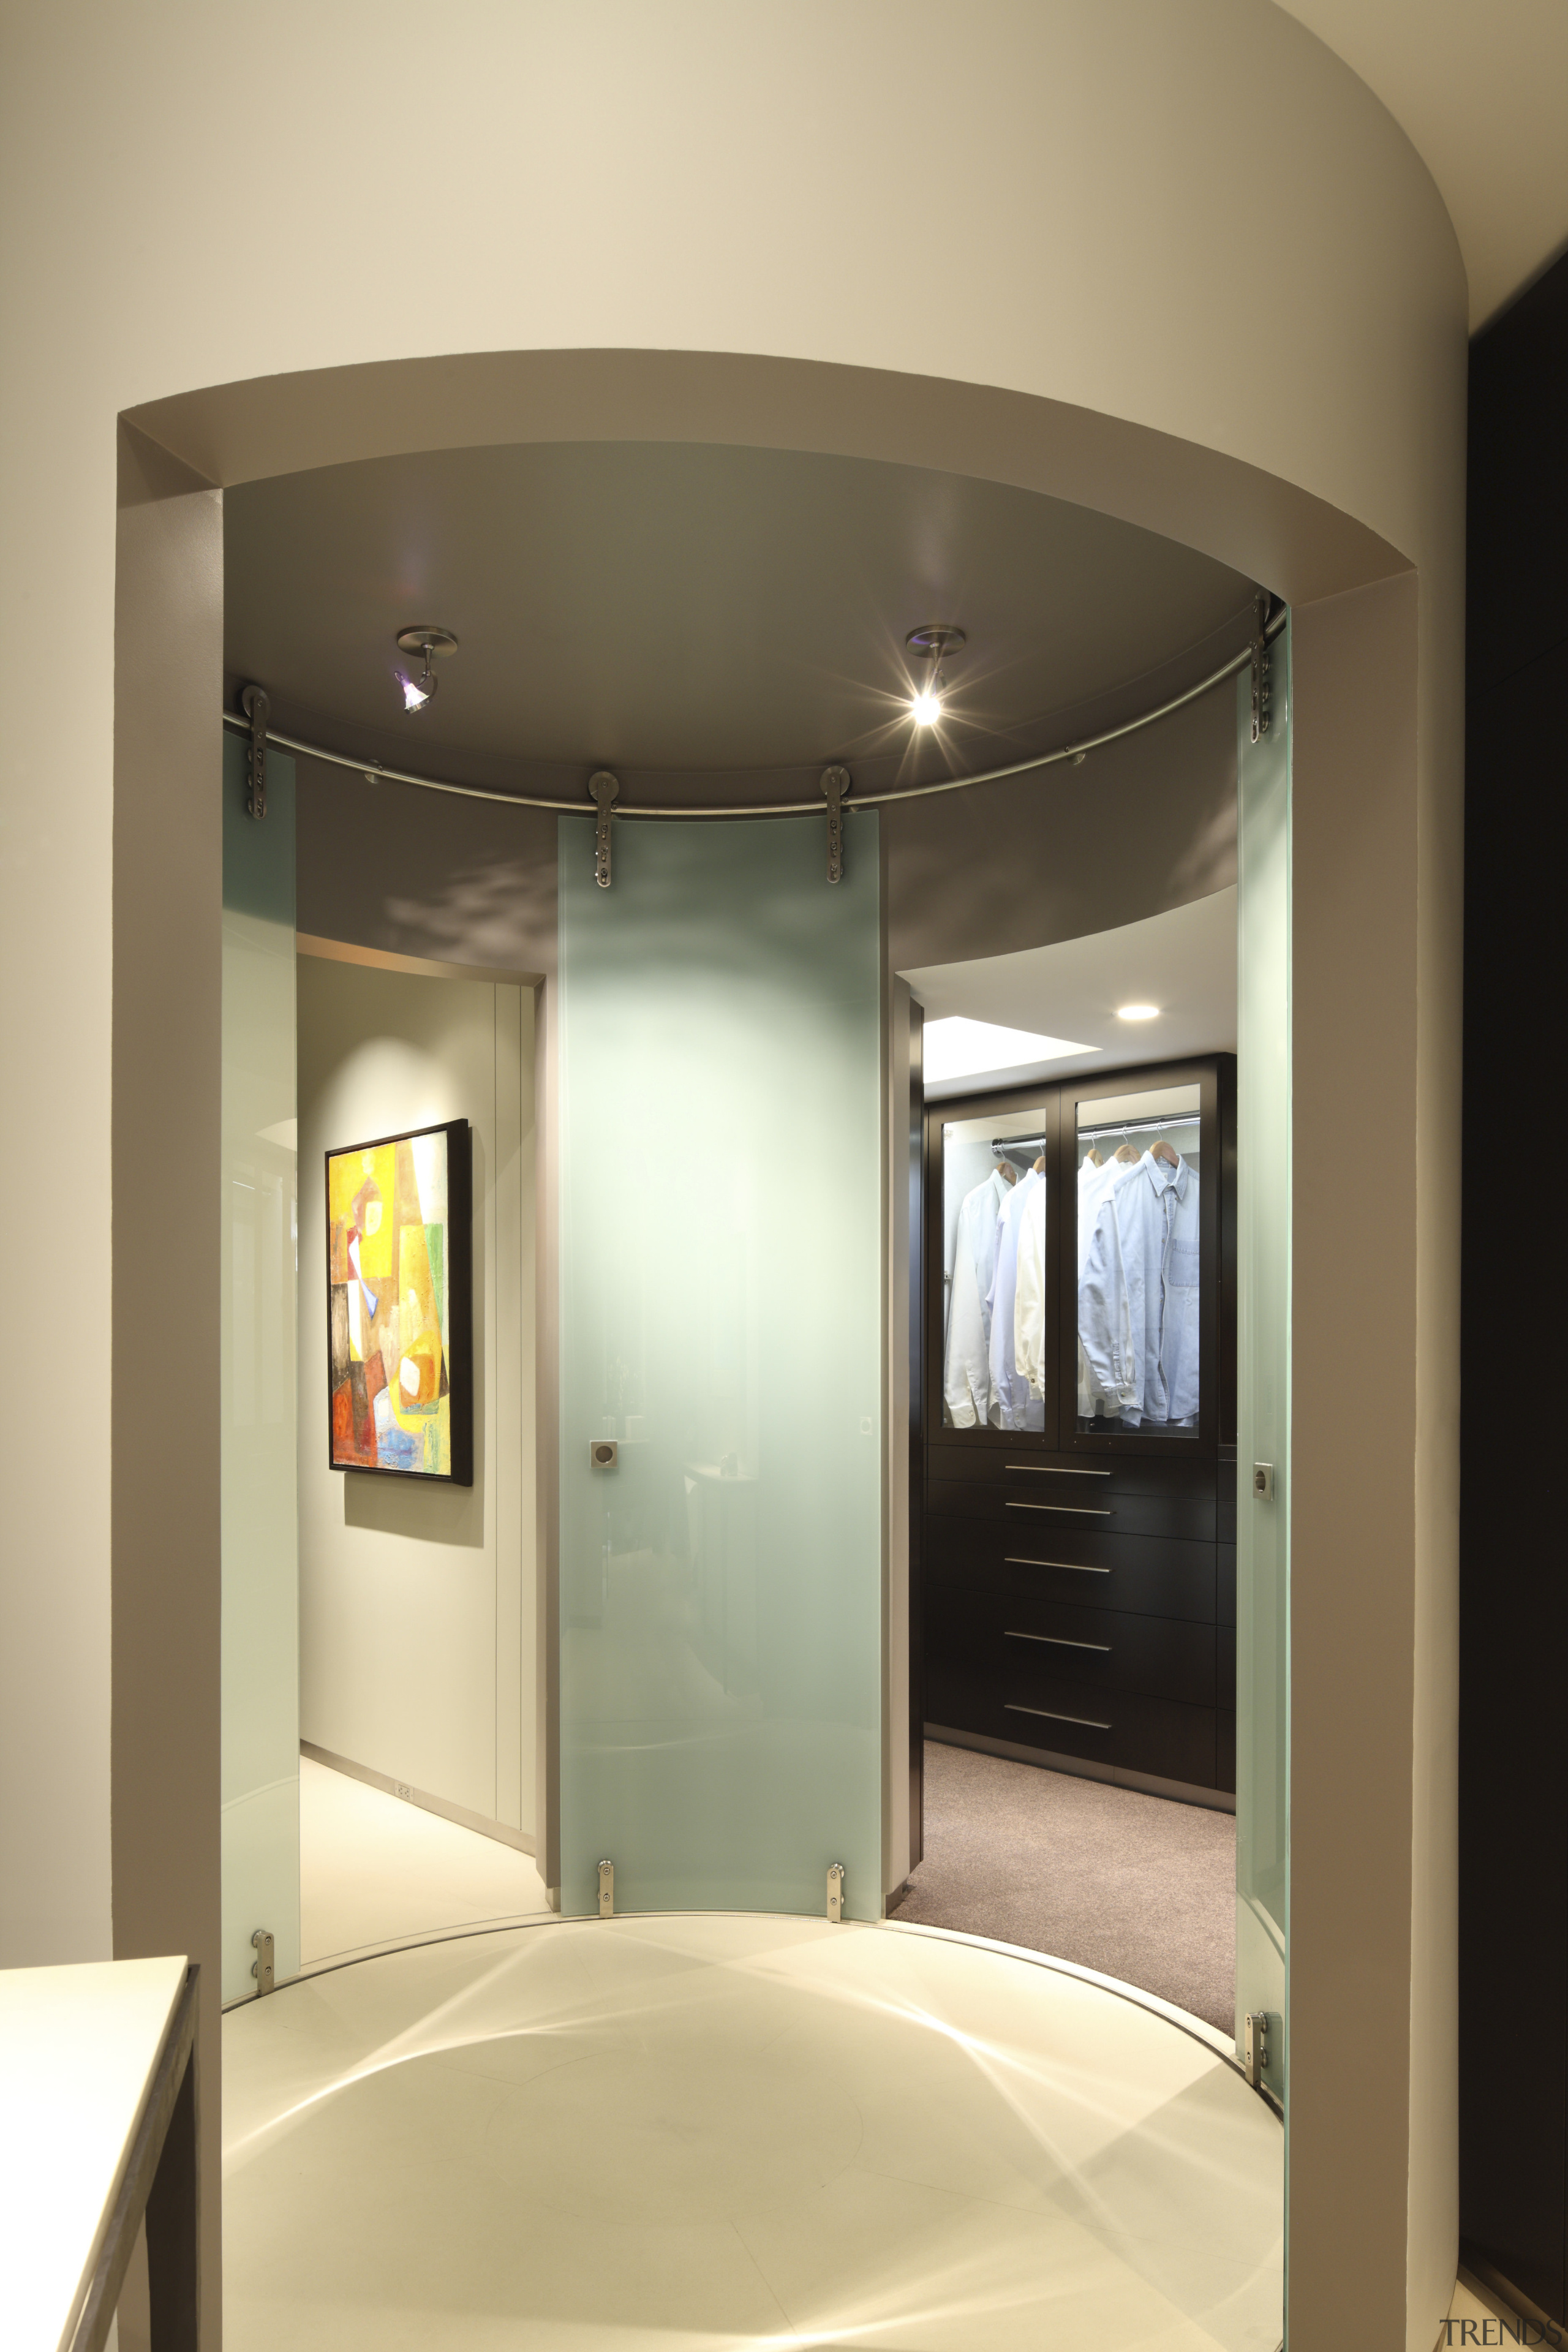 View of circular mirror feature. - View of architecture, bathroom, ceiling, door, interior design, room, orange, brown